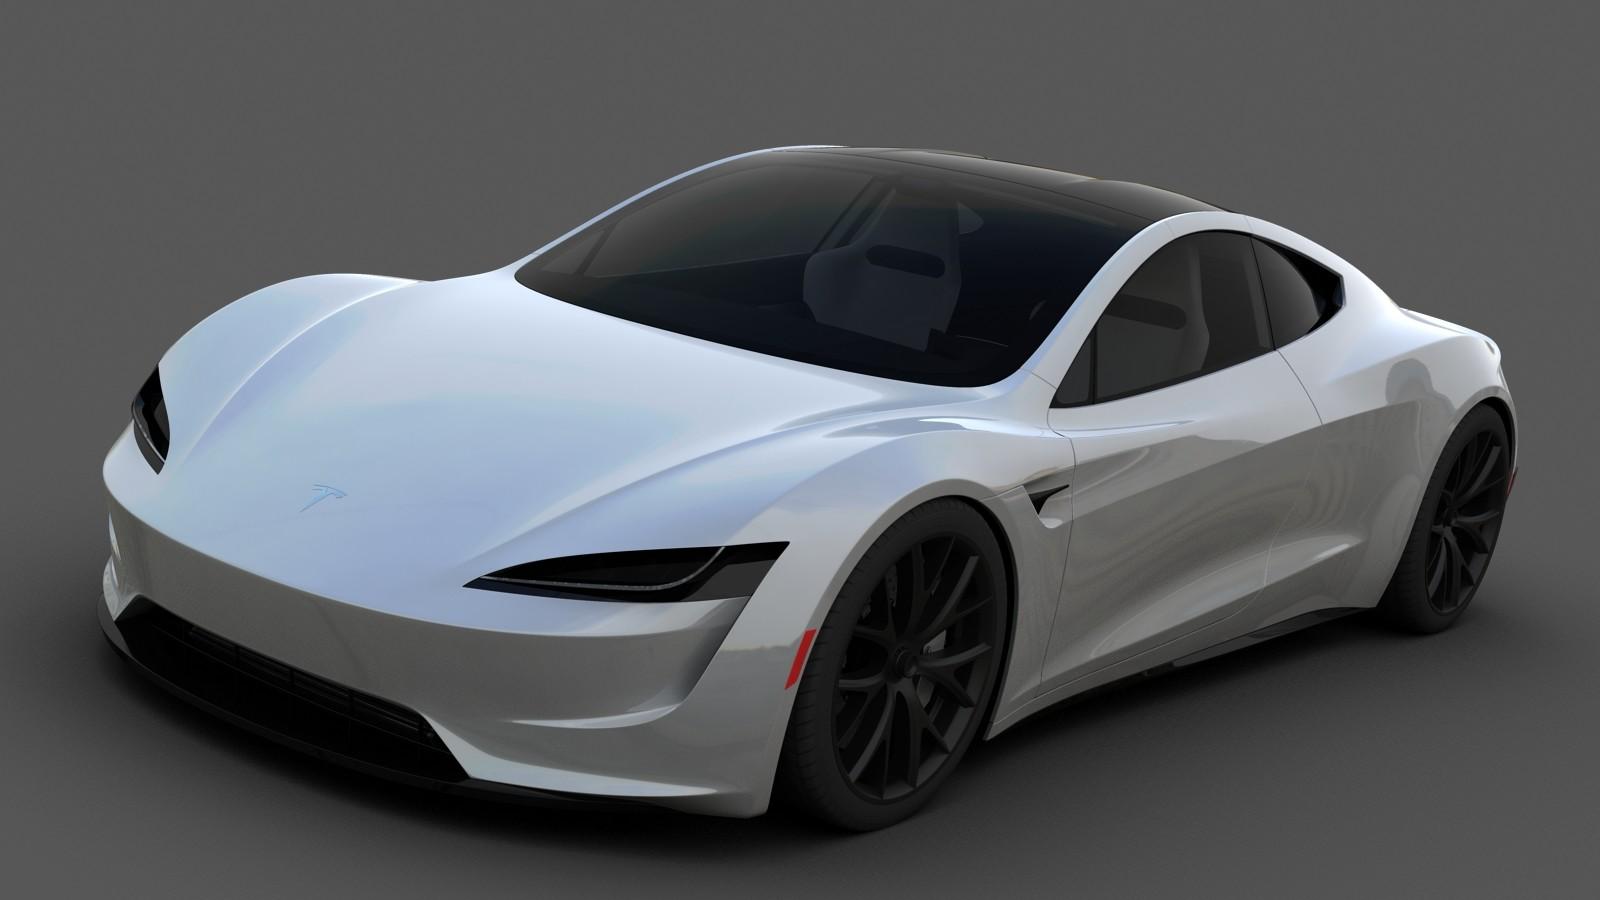 Car Wallpaper In 3d Wiktor Urbańczyk Tesla Roadster 2 0 2020